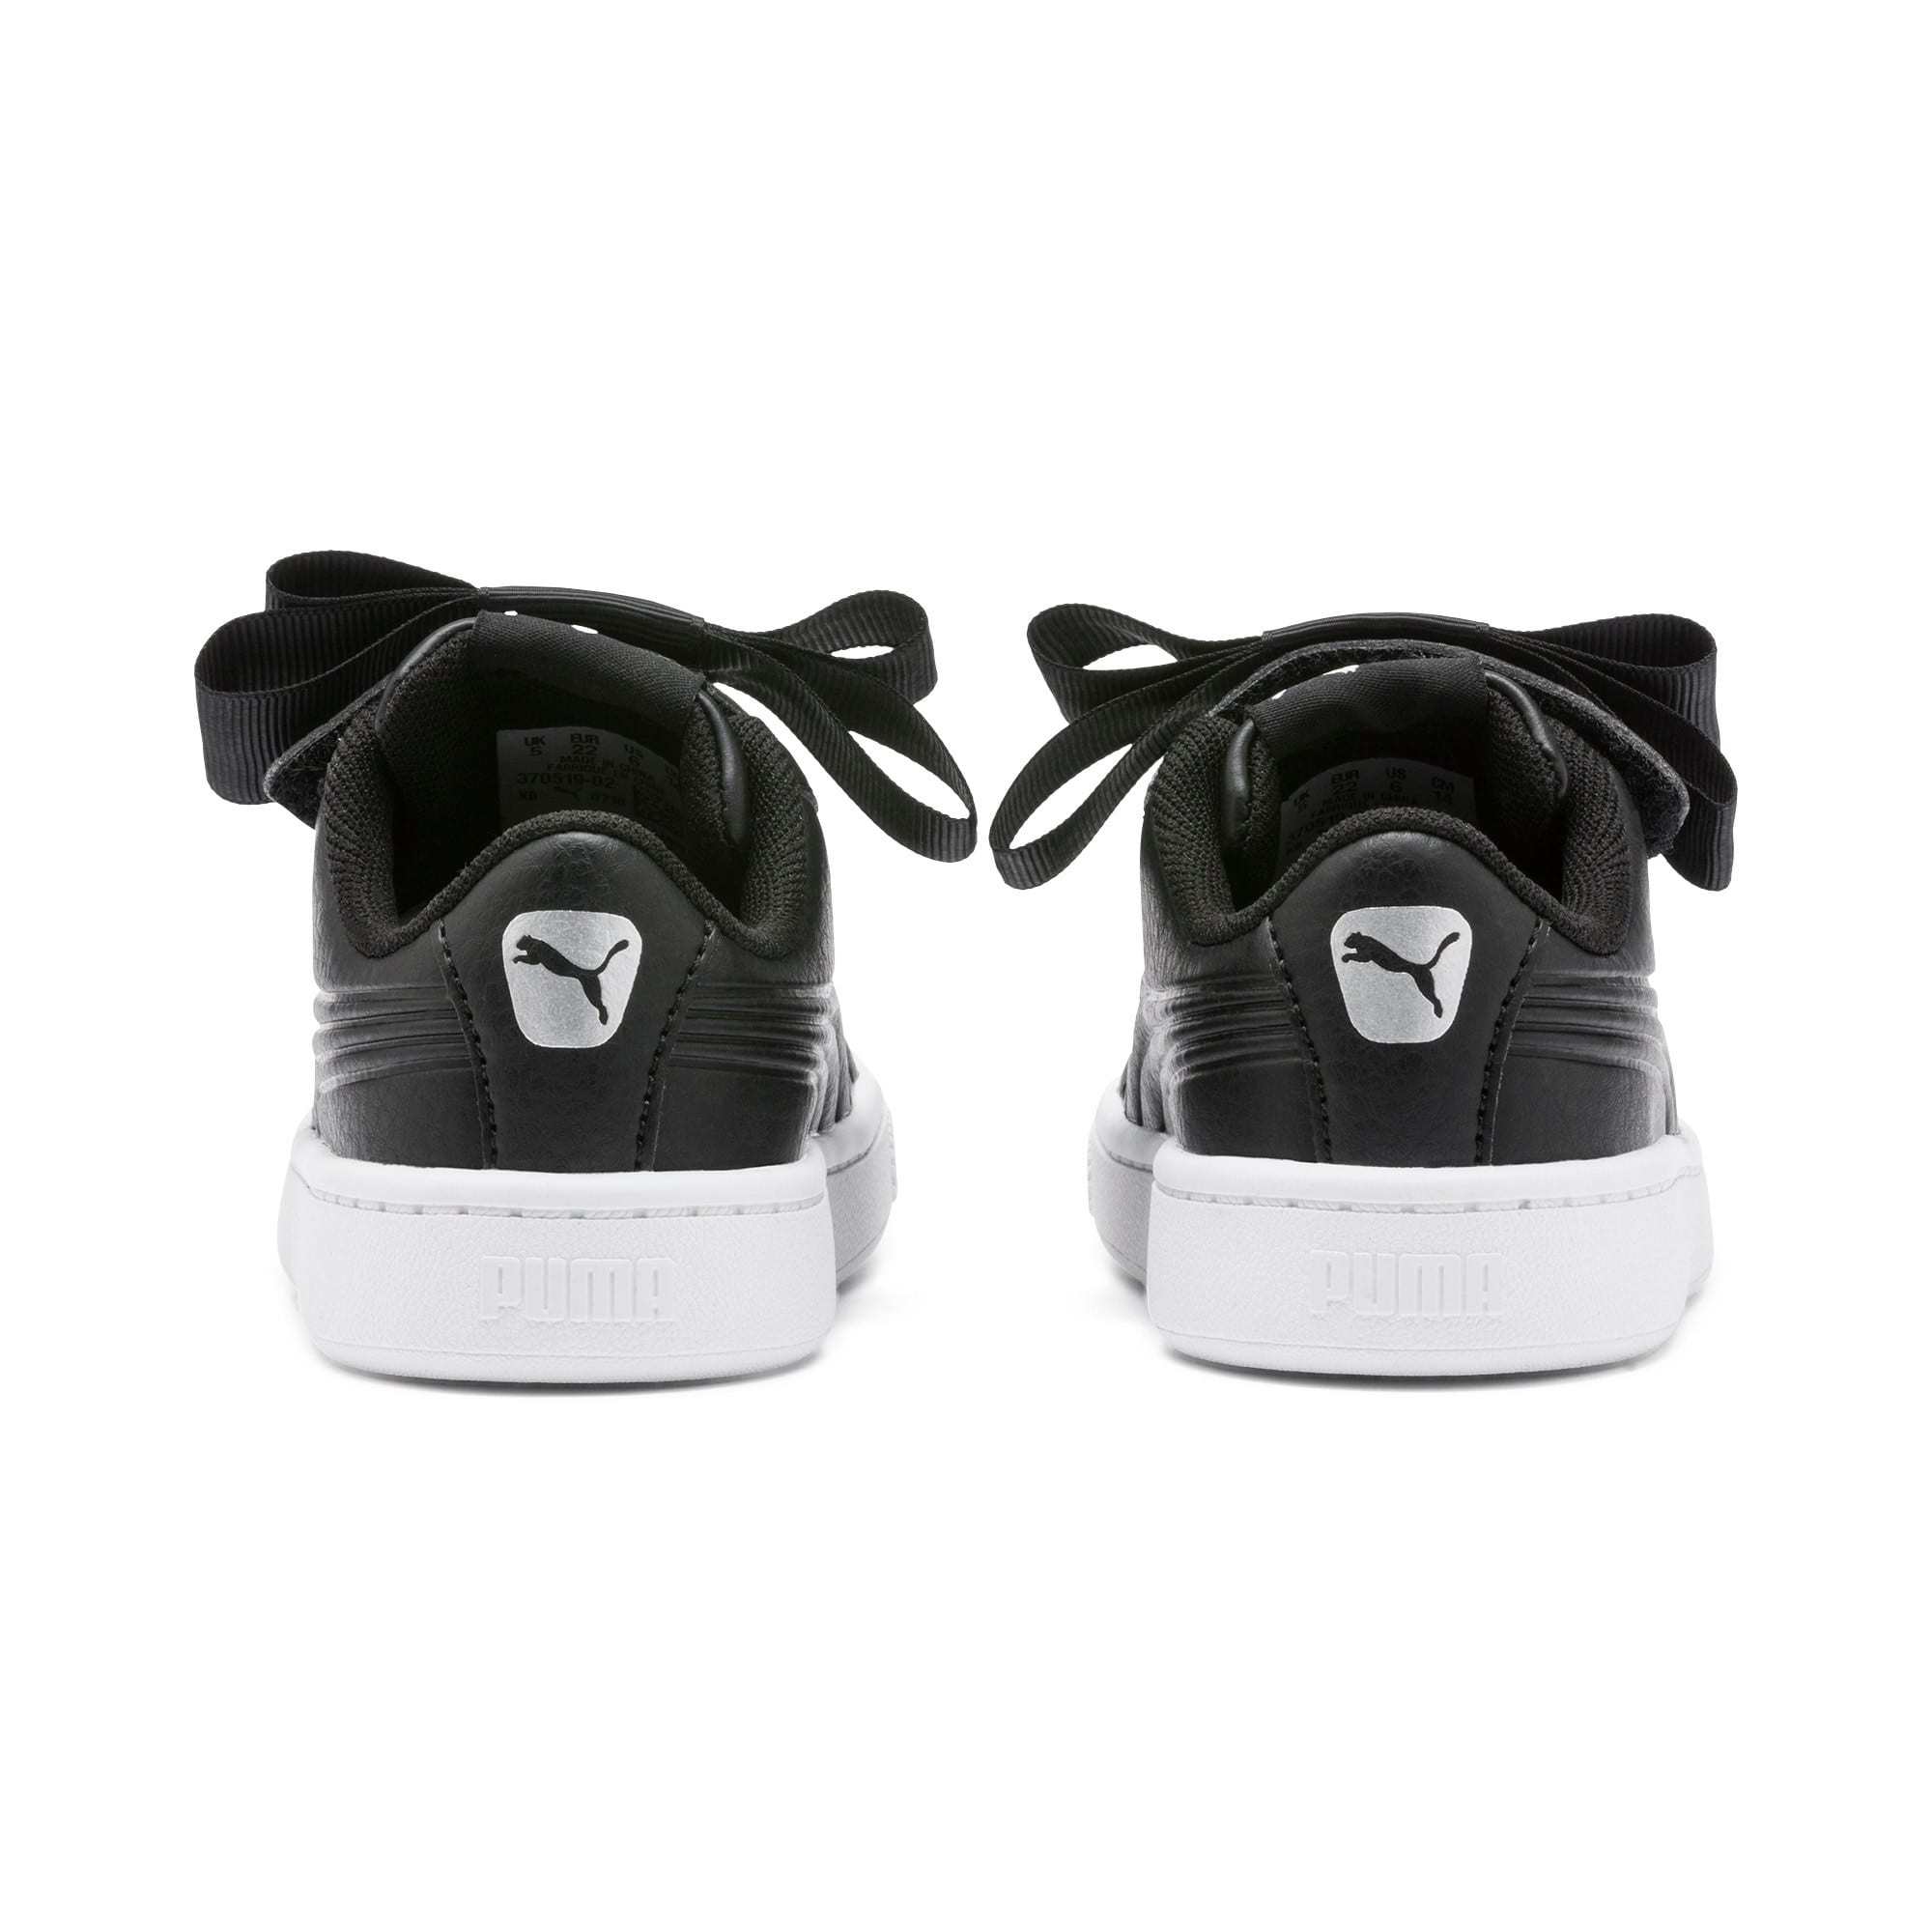 Thumbnail 3 of Vikky v2 Ribbon SL AC Babies' Trainers, Puma Black-Puma Silver-White, medium